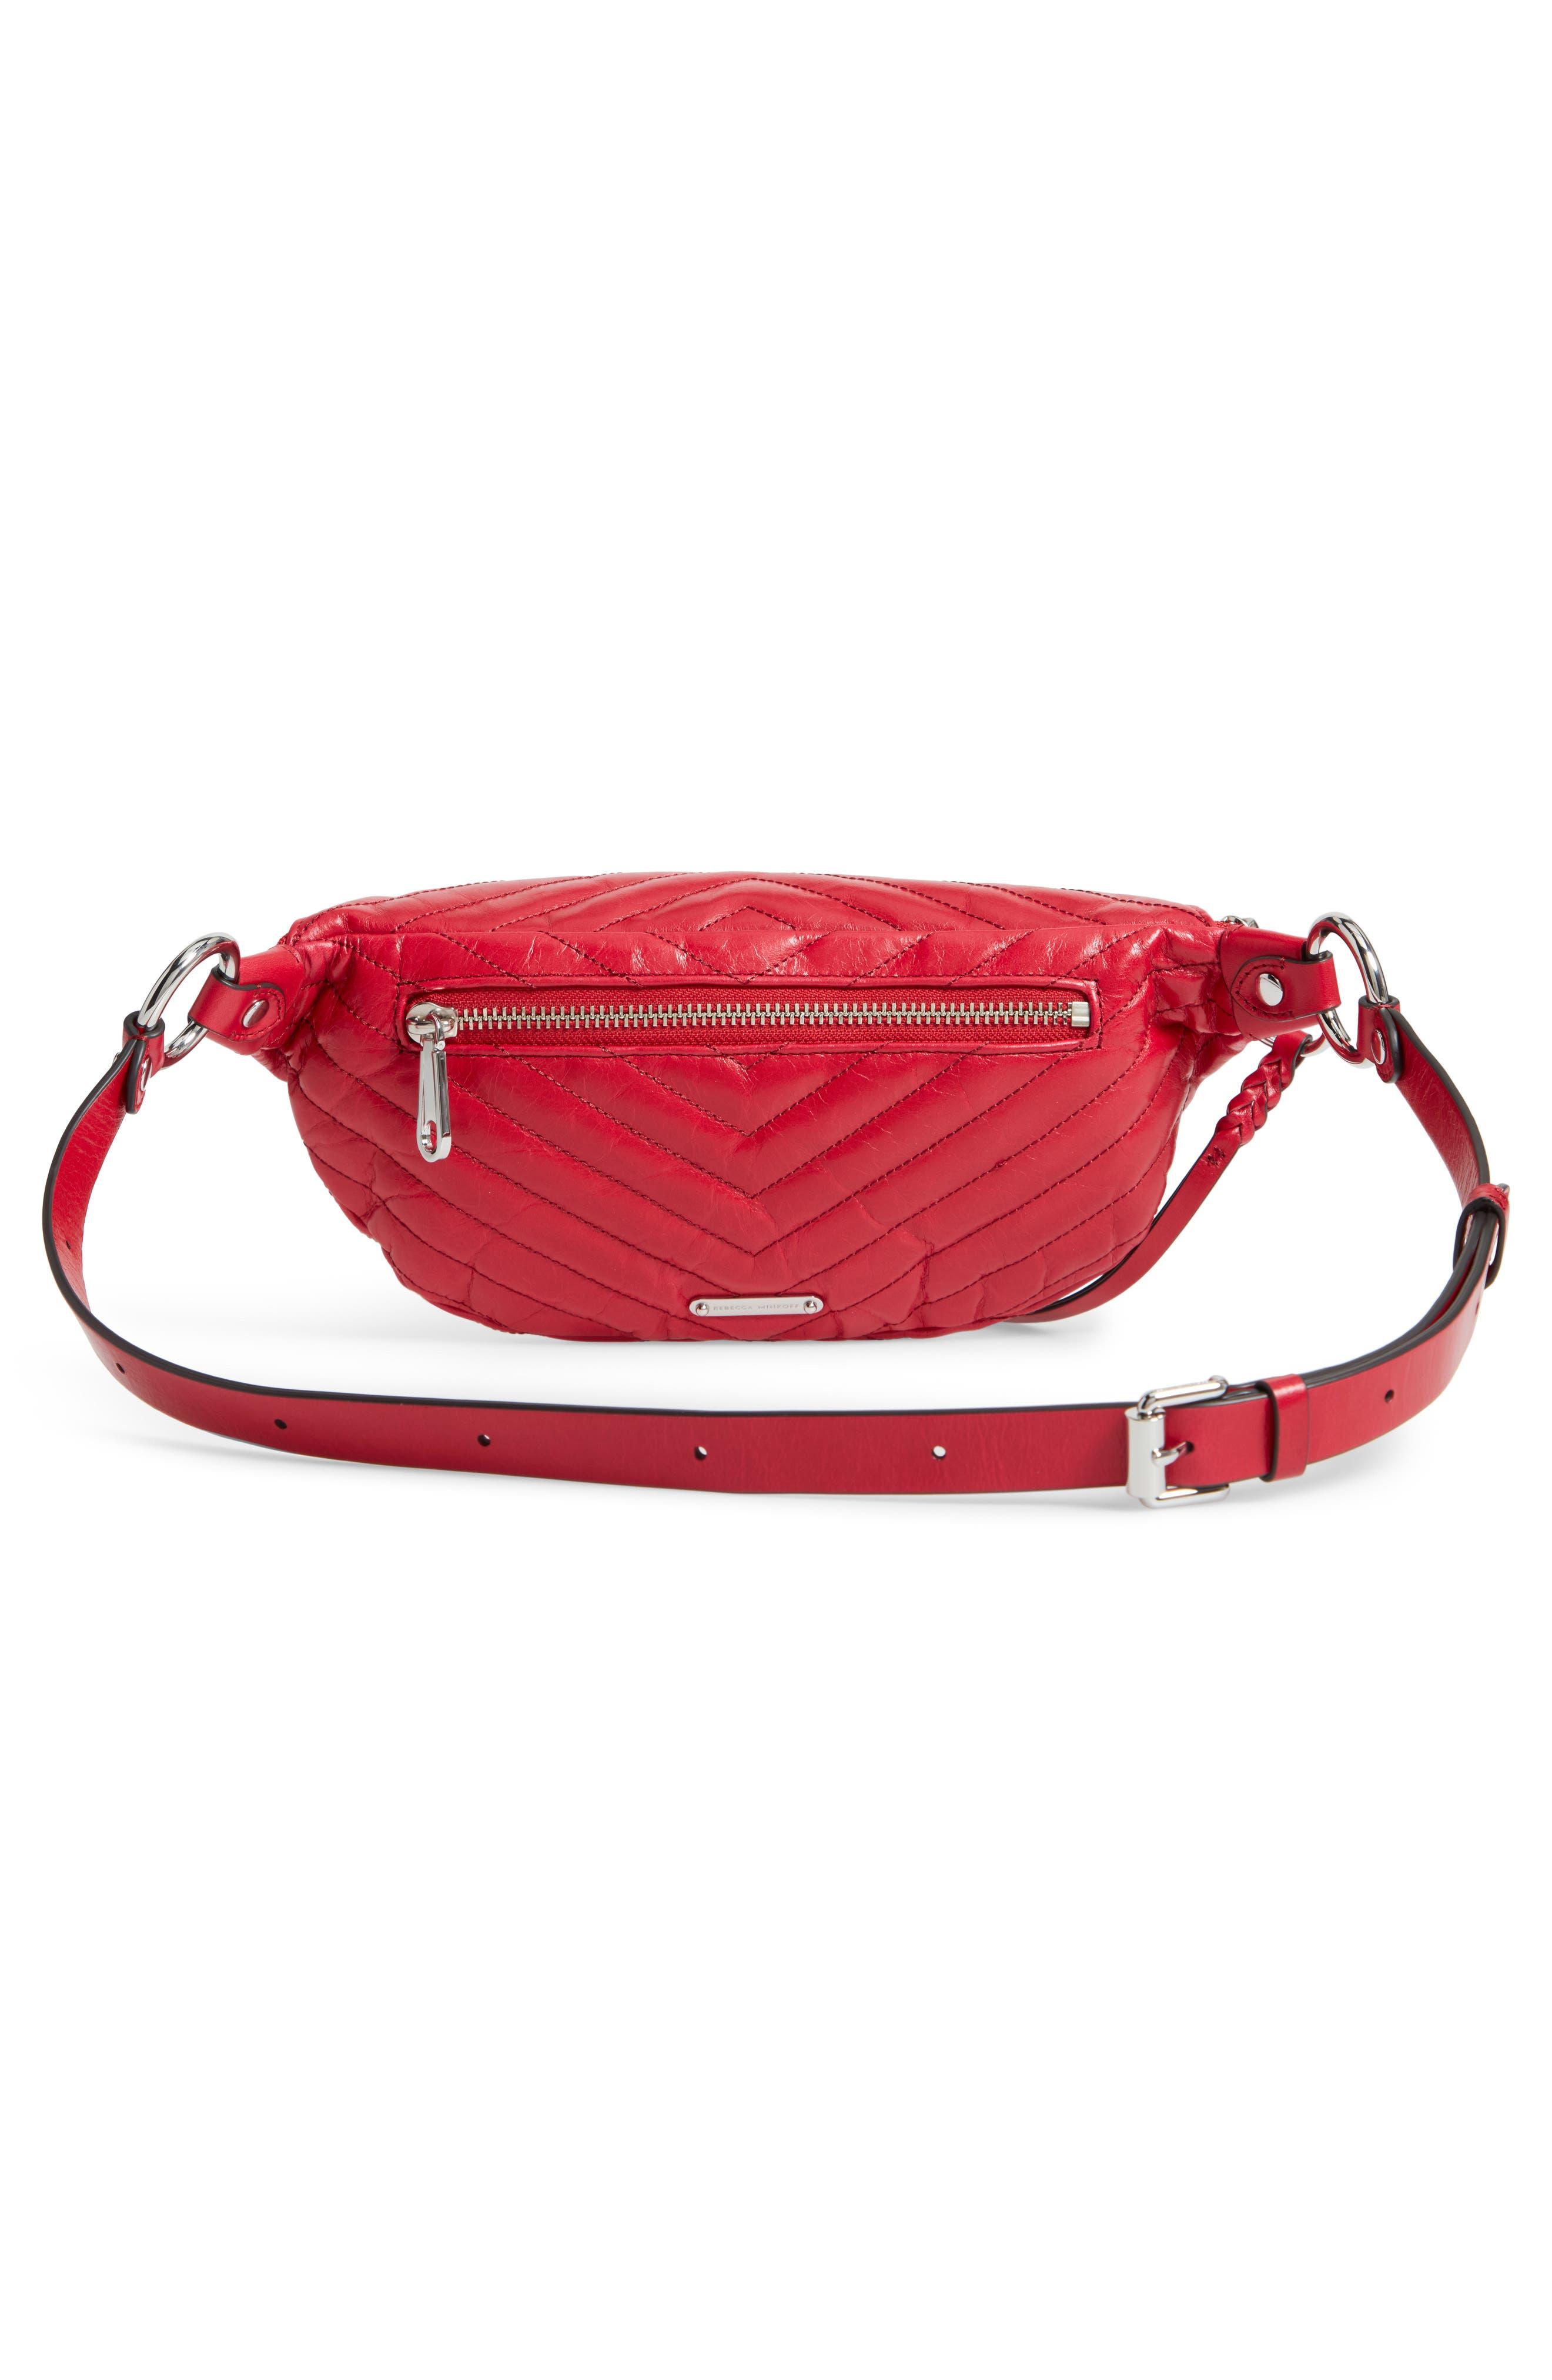 Edie Leather Belt Bag,                             Alternate thumbnail 4, color,                             SCARLET